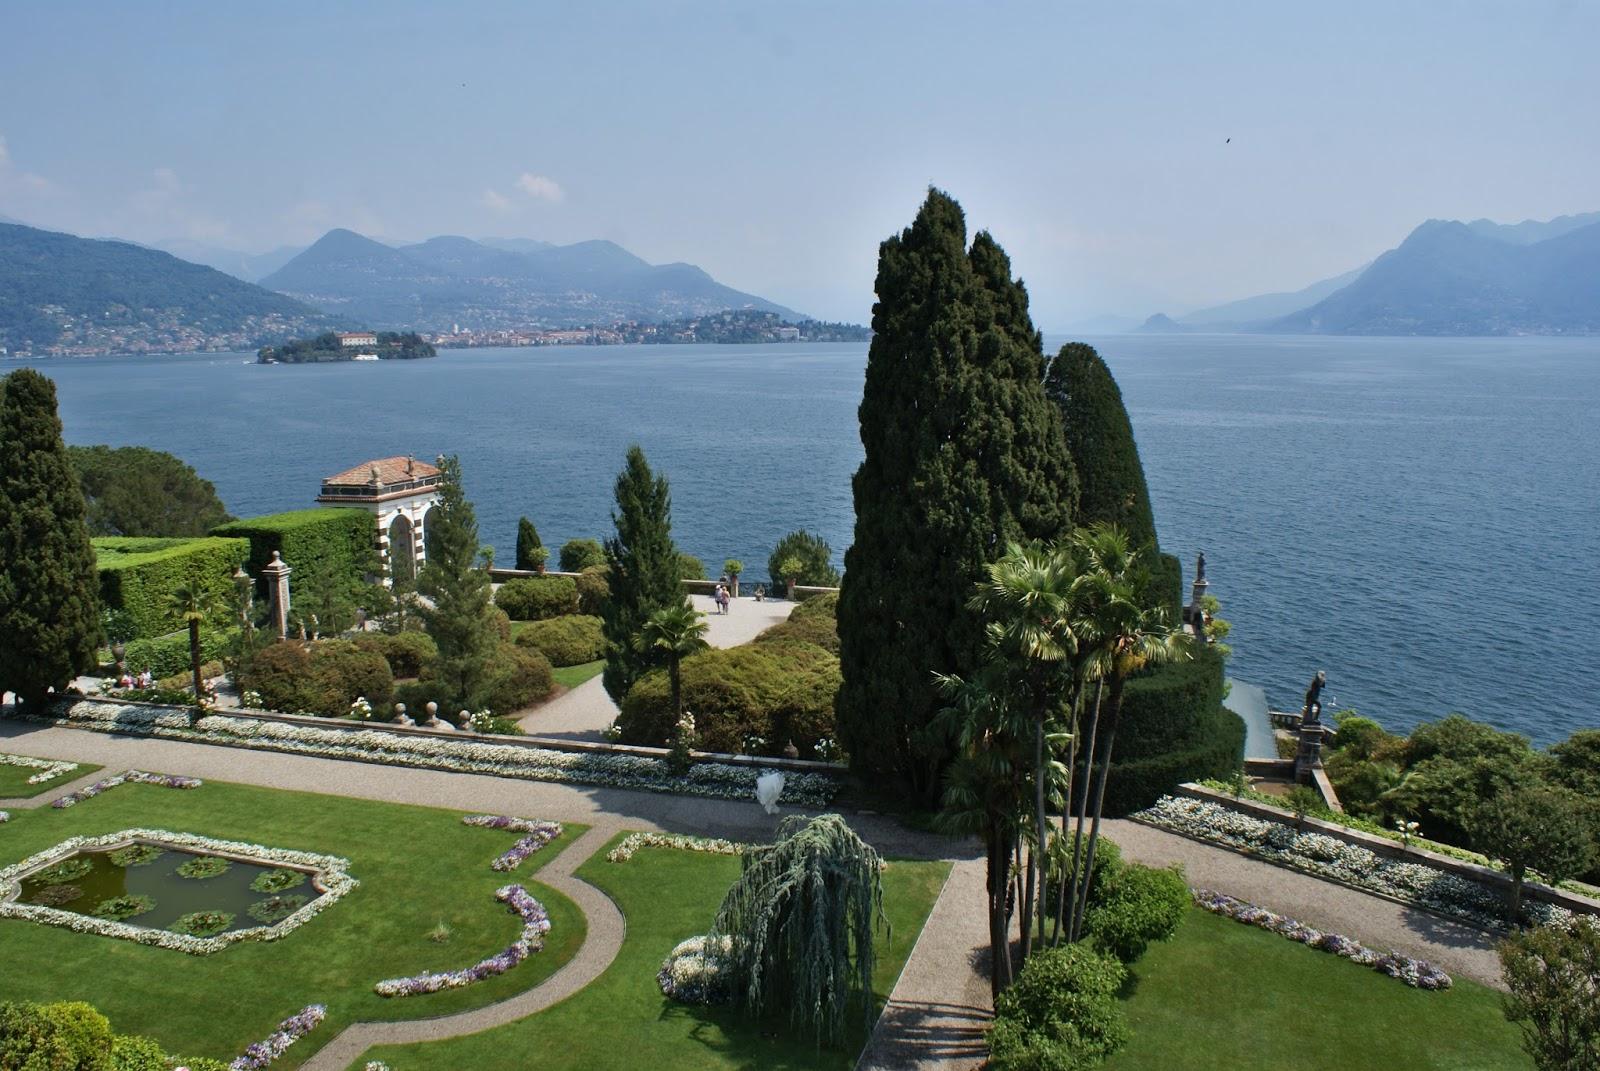 garden giardino isole borromee borromées isola bella lago maggiore piemonte italy